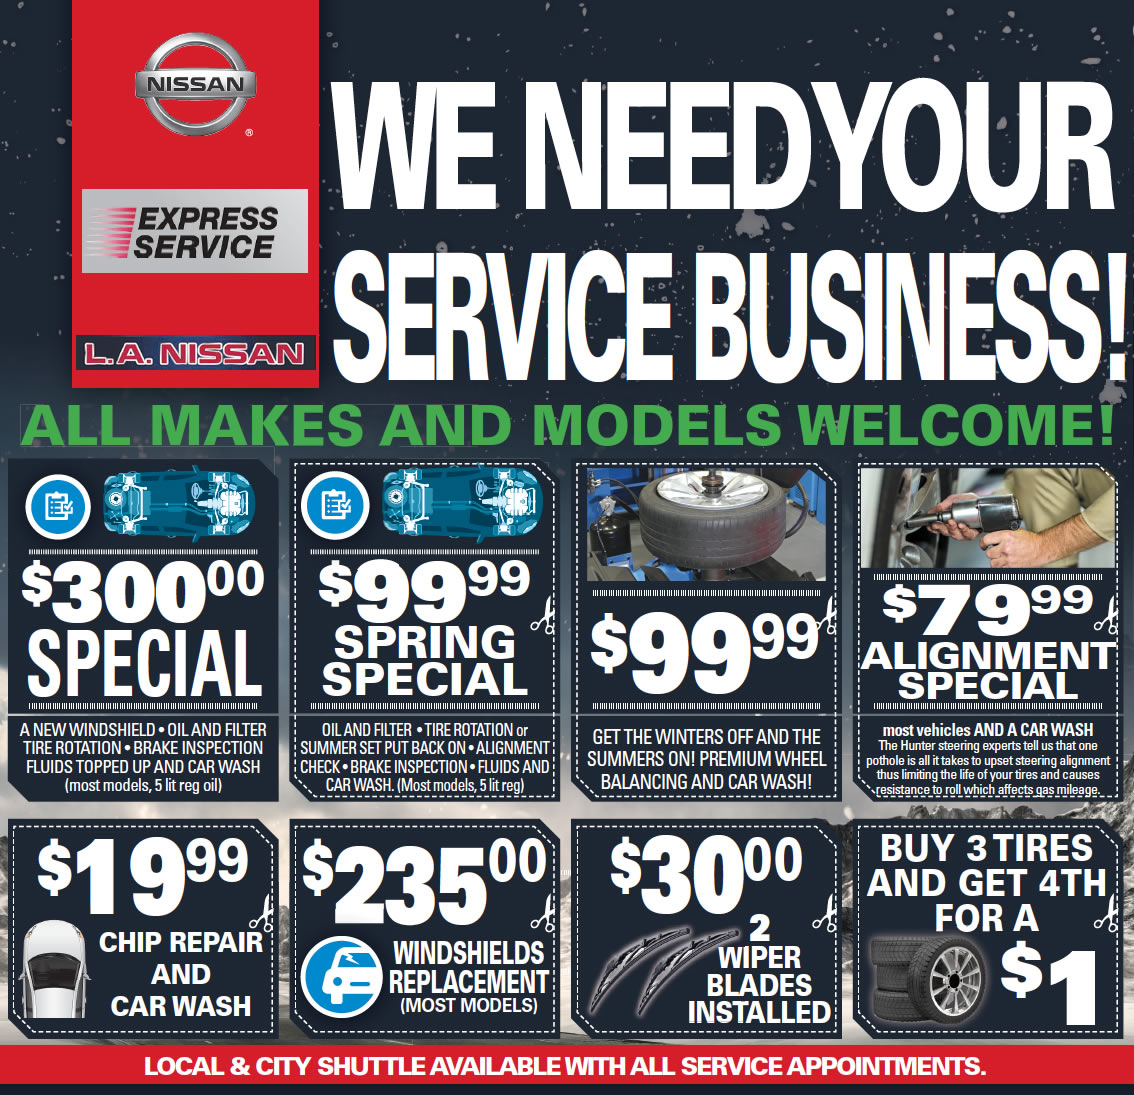 Nissan Service Specials in Edmonton, AB